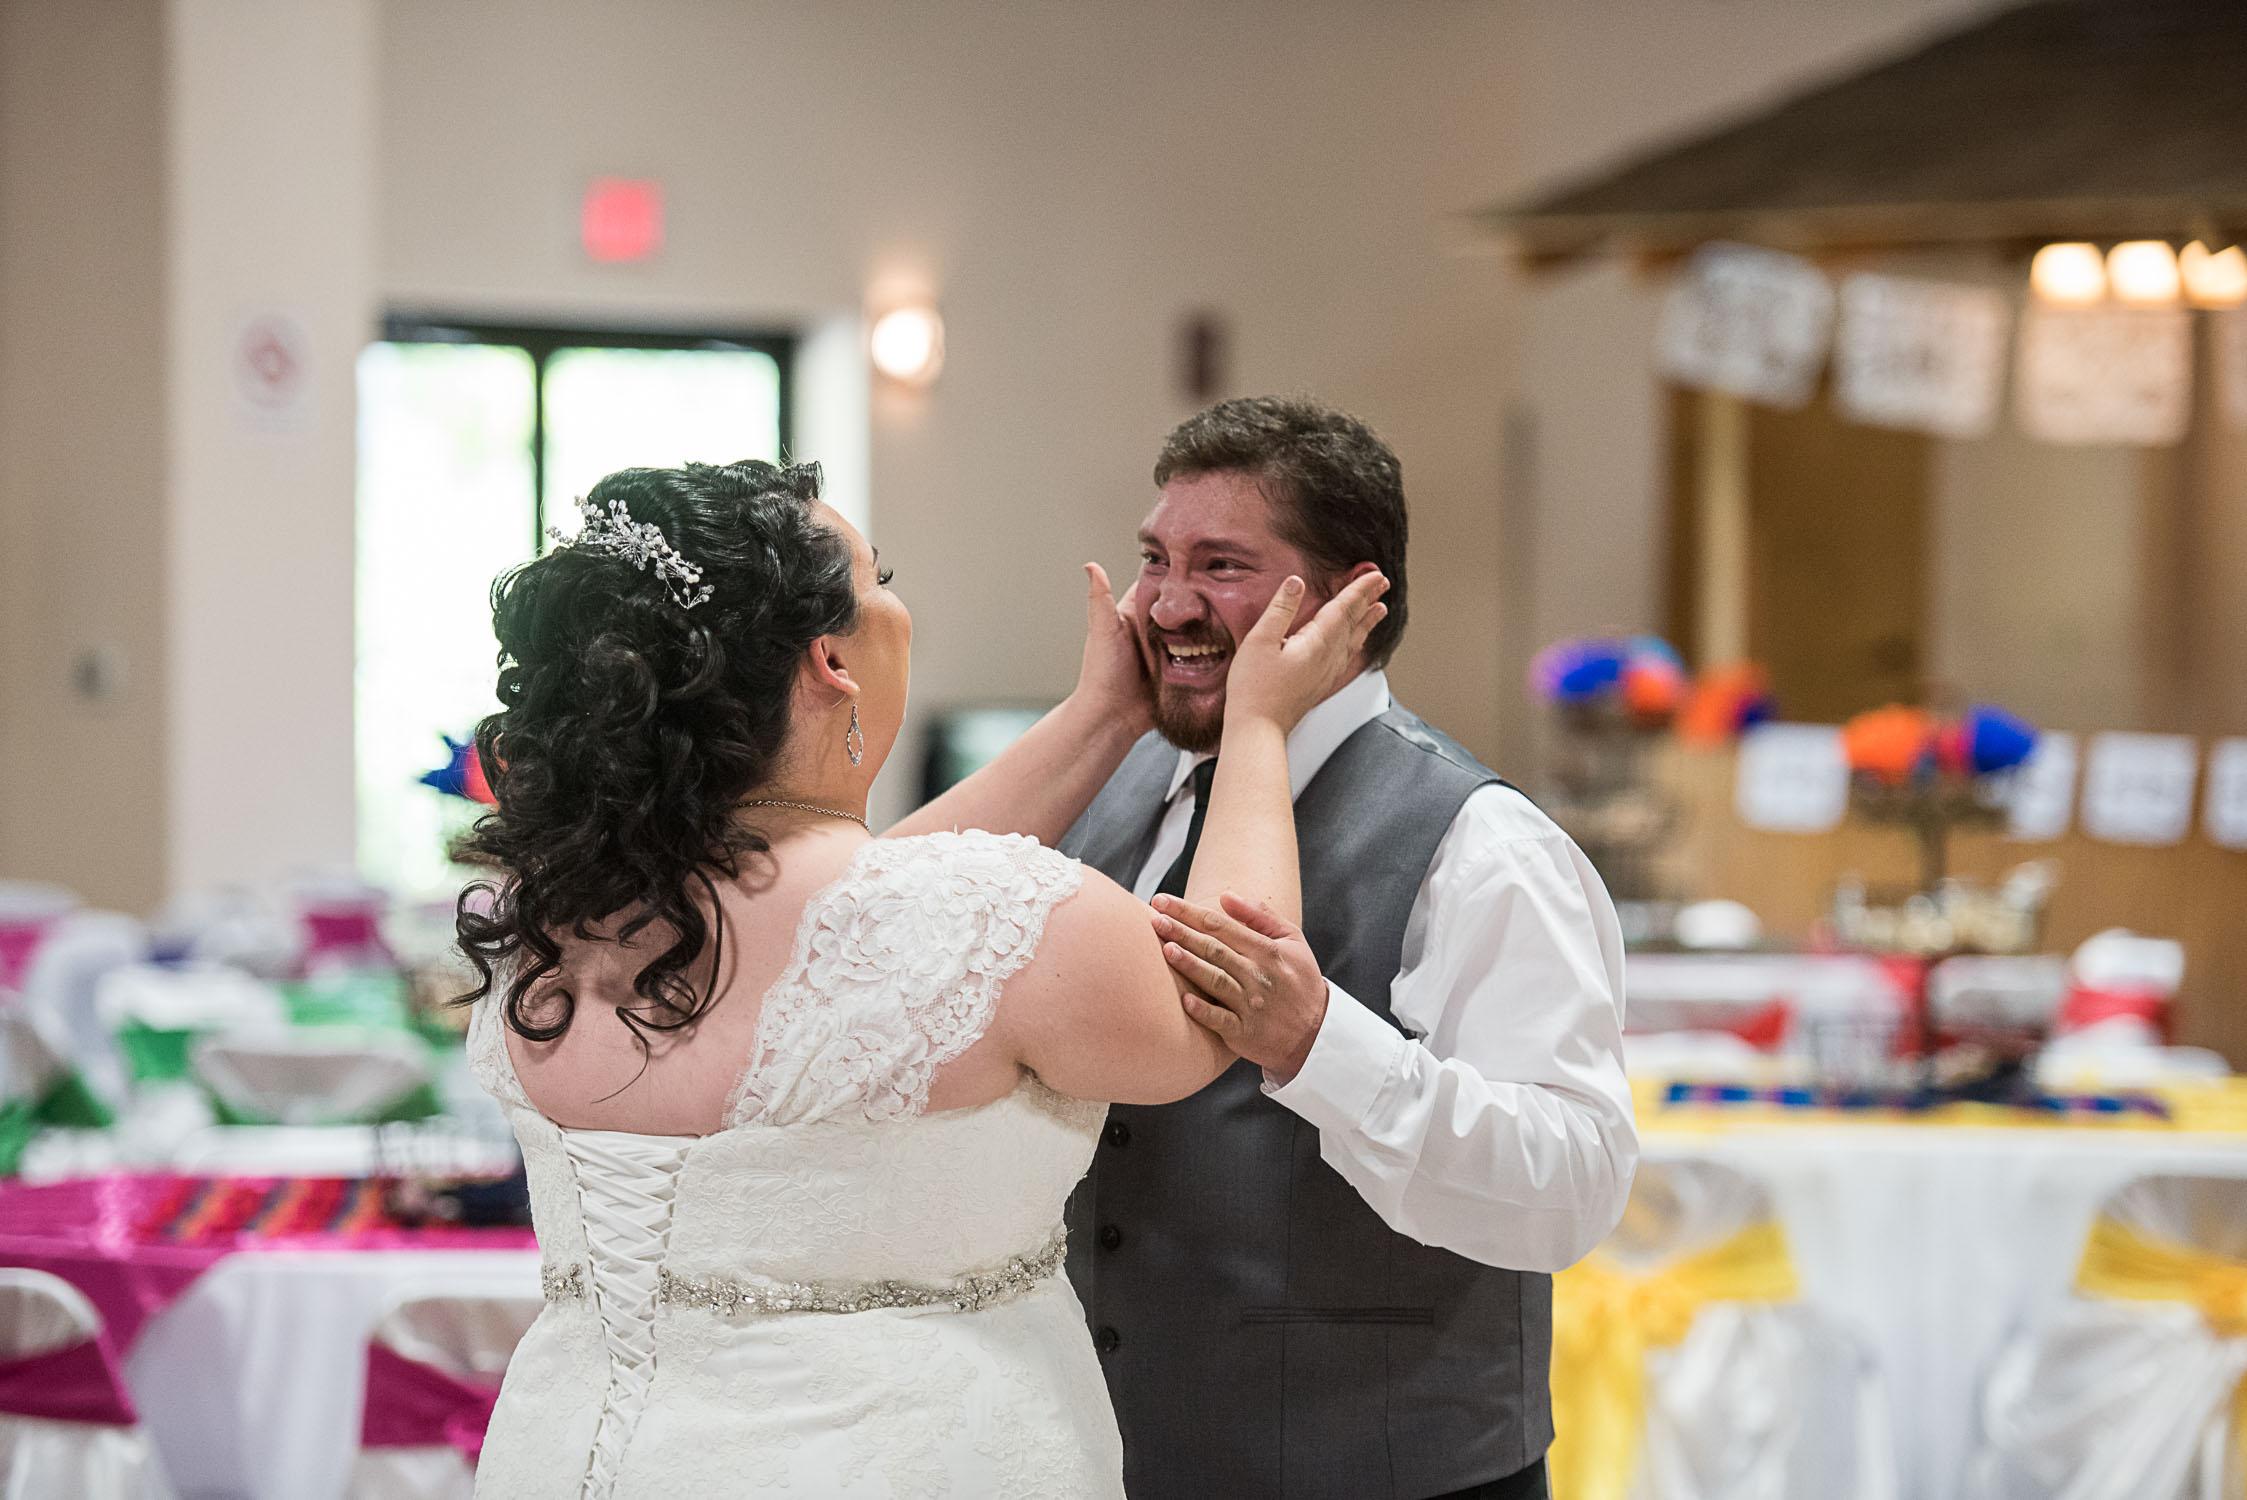 Leal Wedding Mira Visu Photography-69.jpg